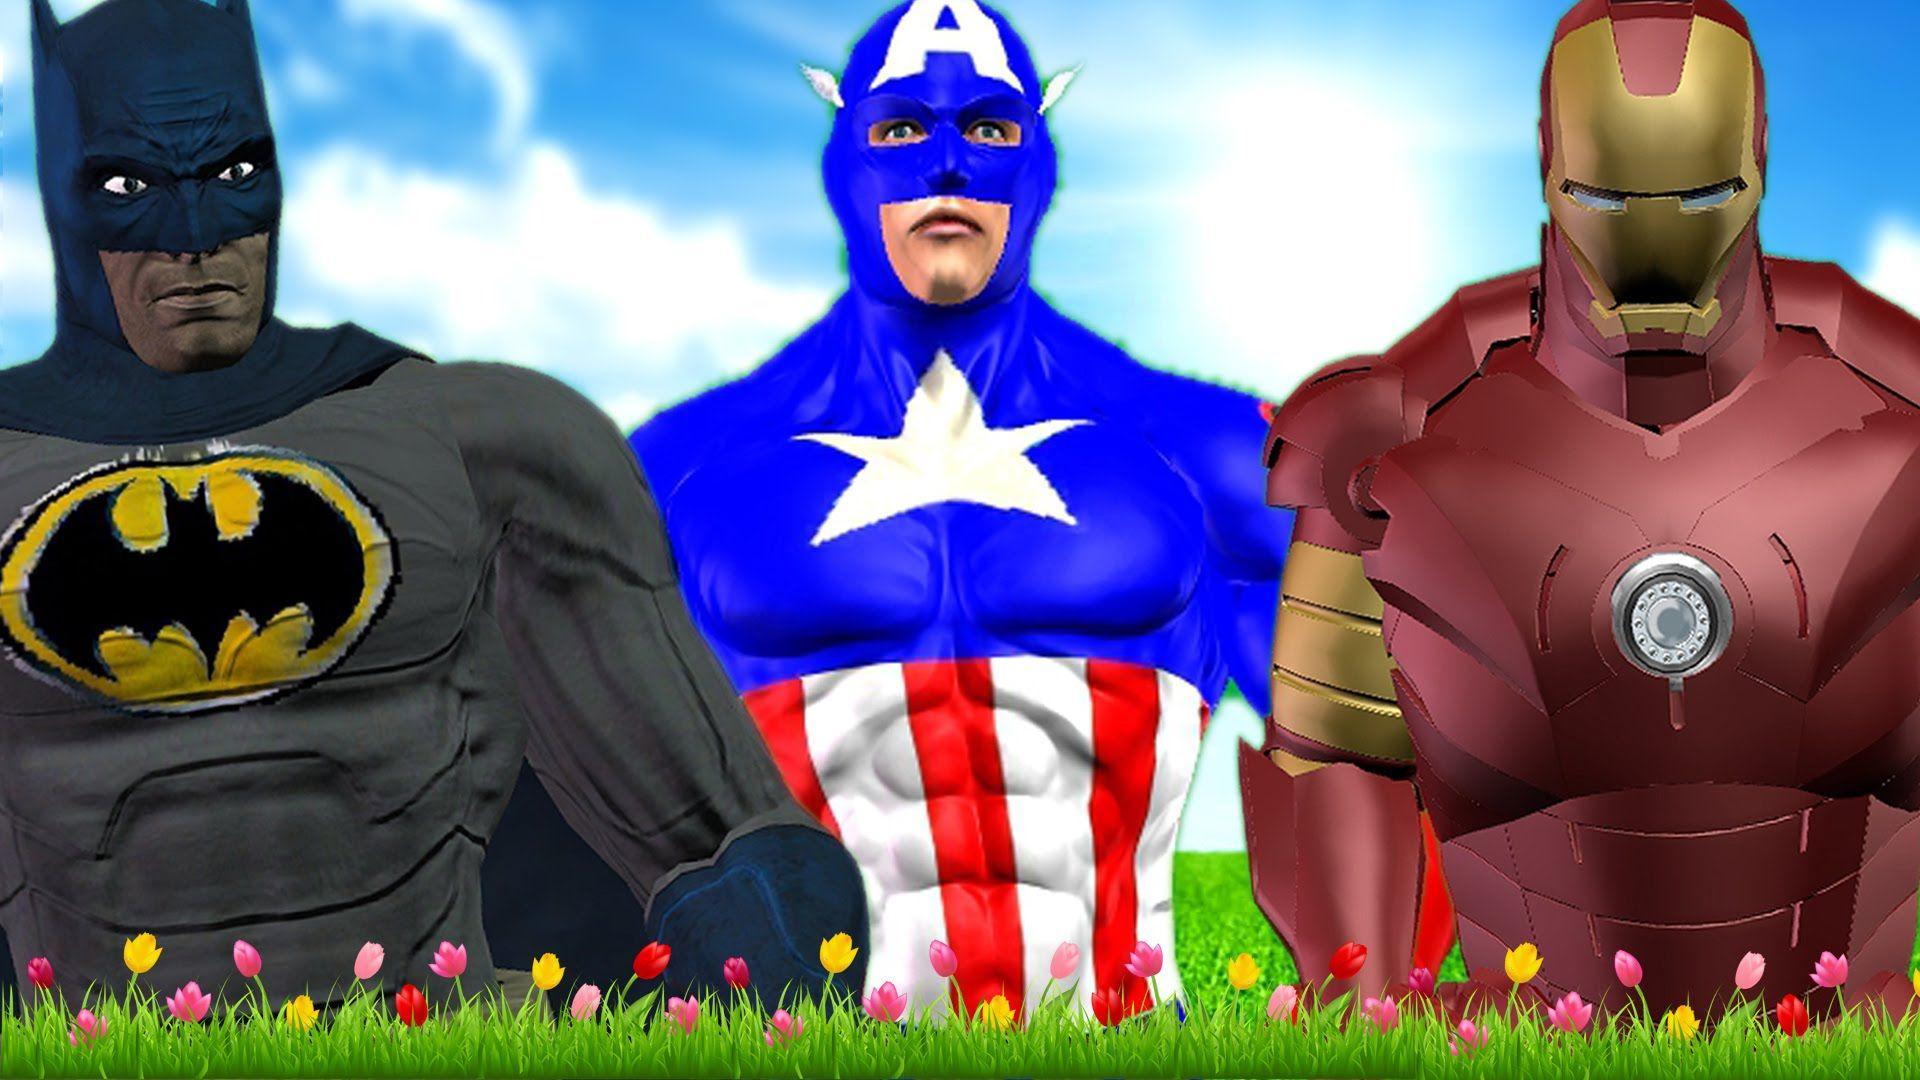 ironman batman captain america cartoons dancing videos superheroes